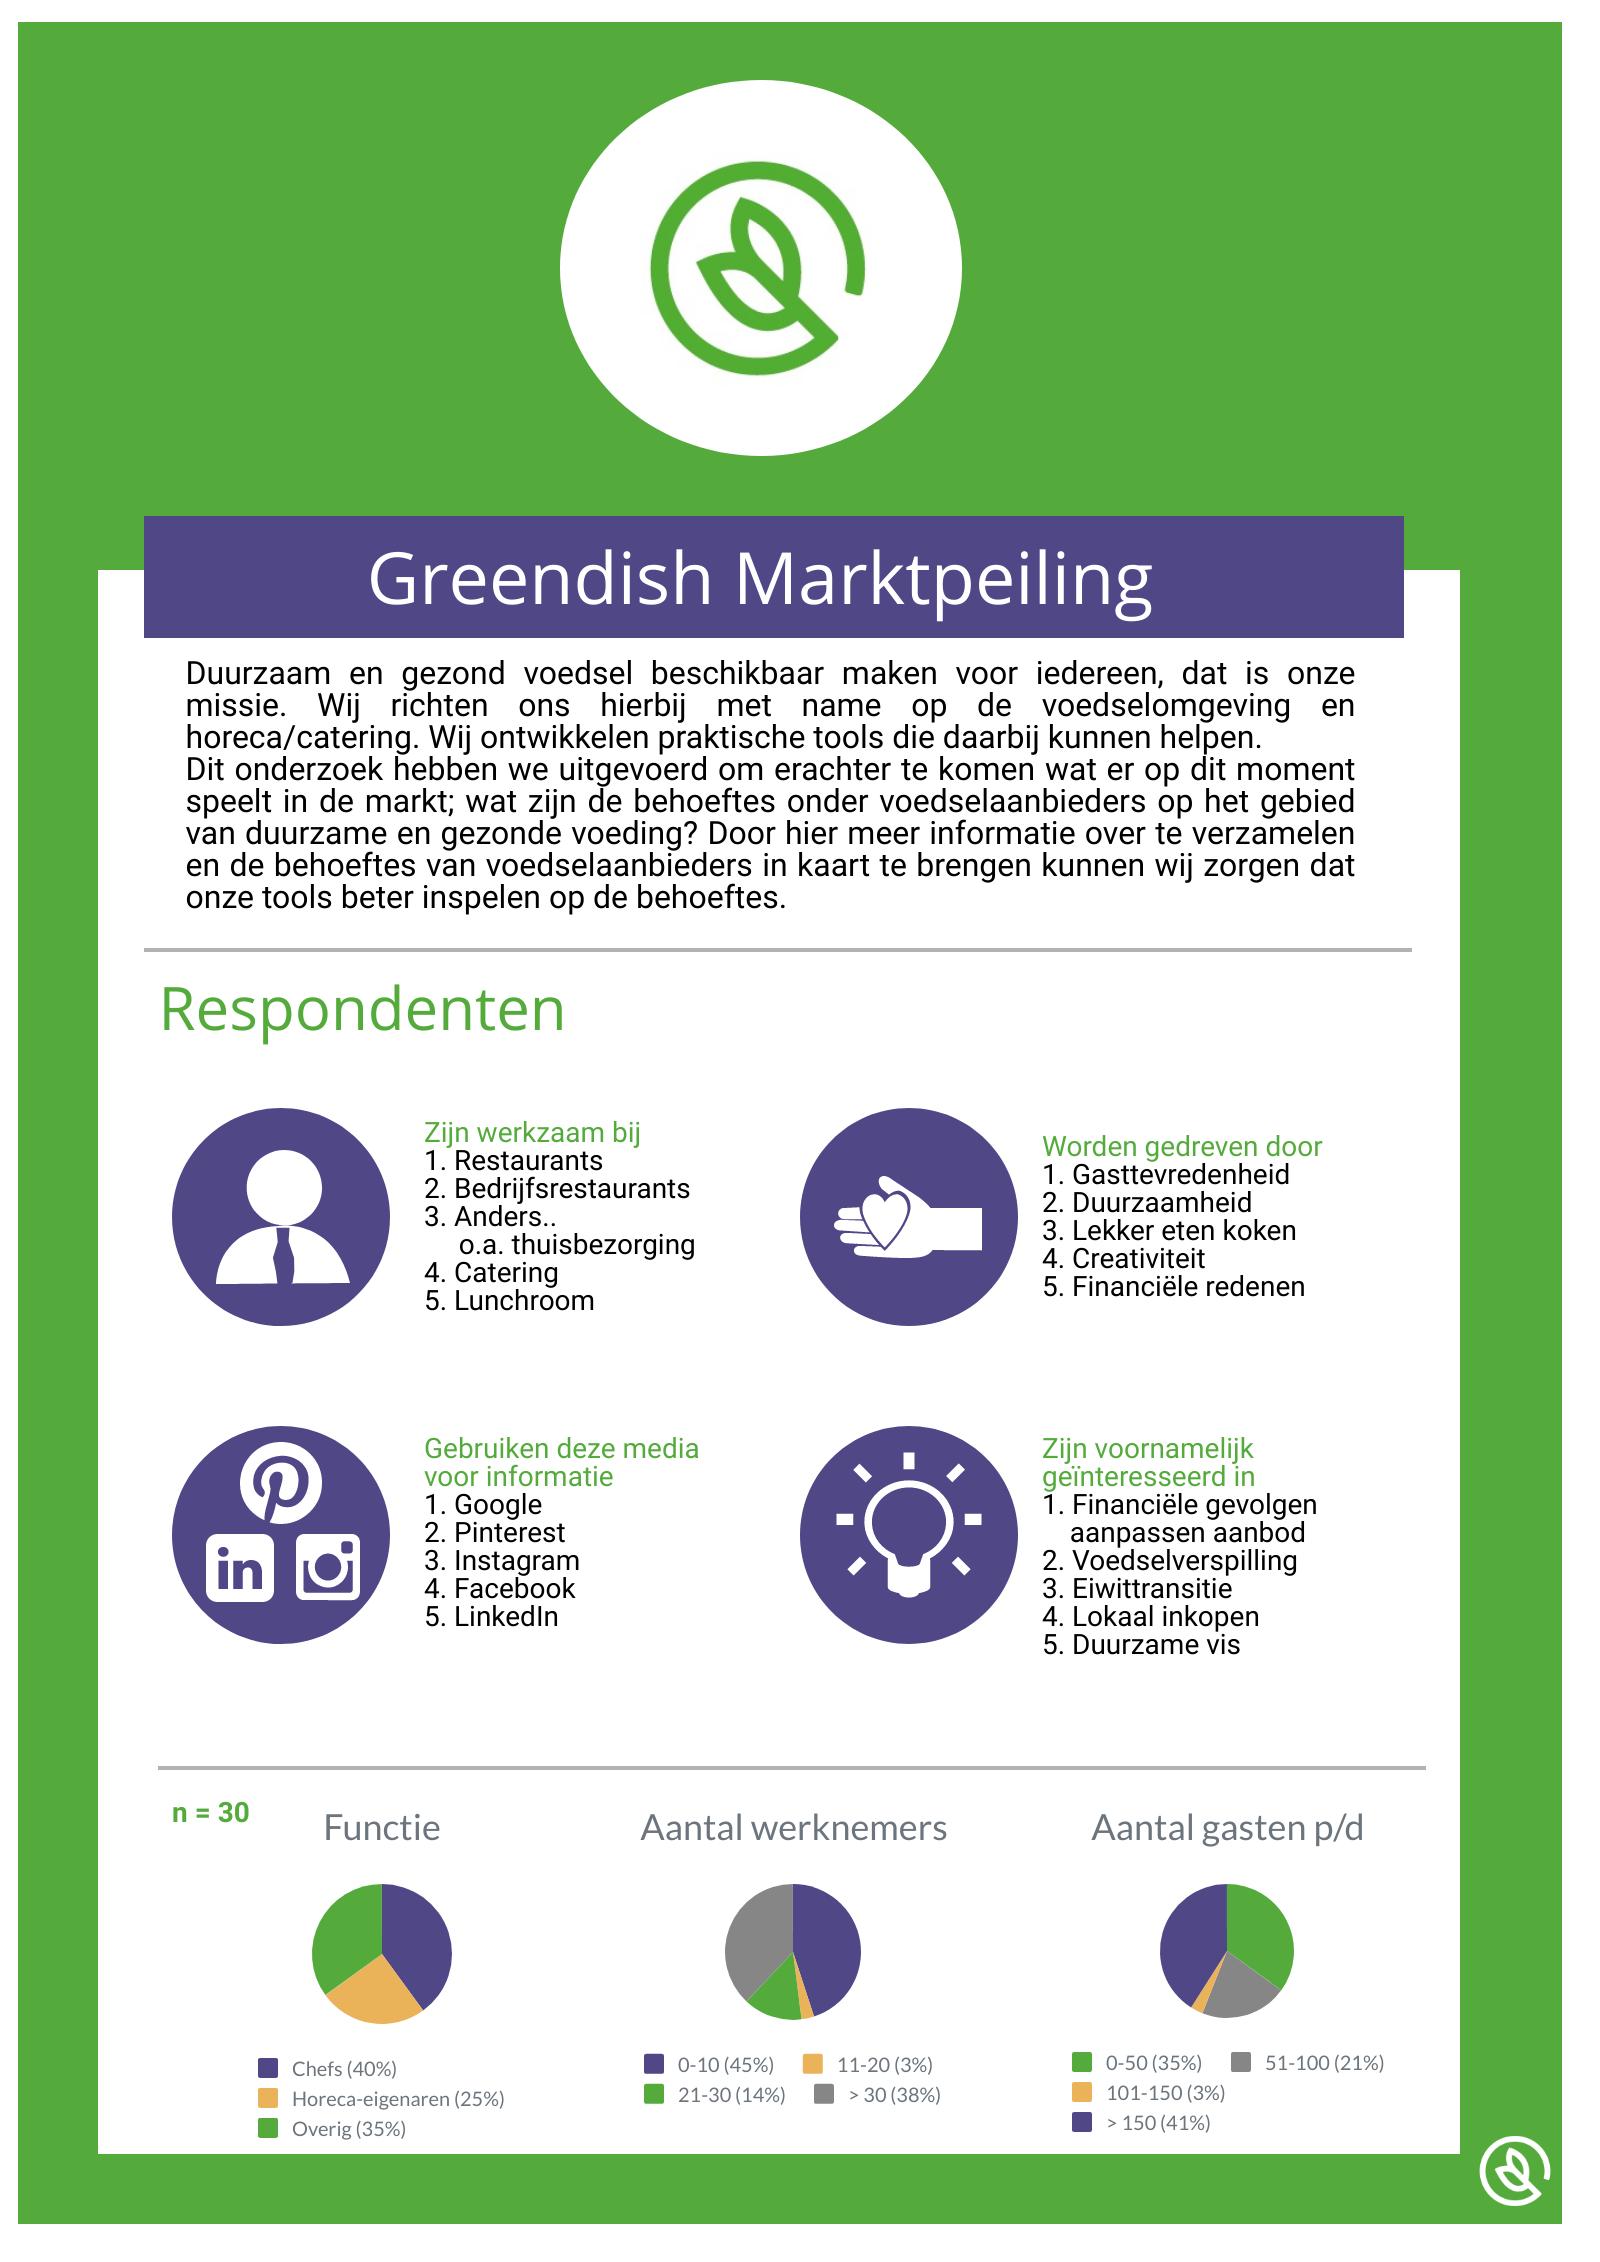 greendish marktpeiling